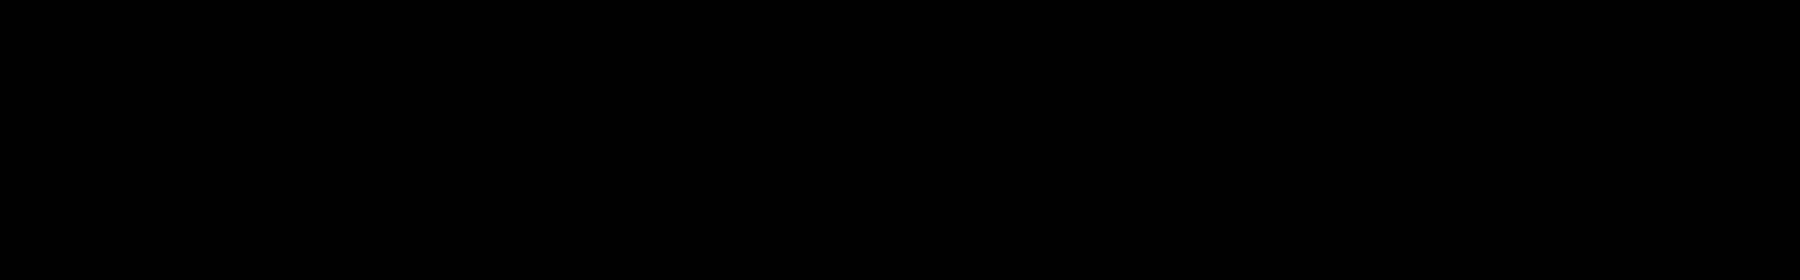 Complete Techno by NoizyKnobs audio waveform